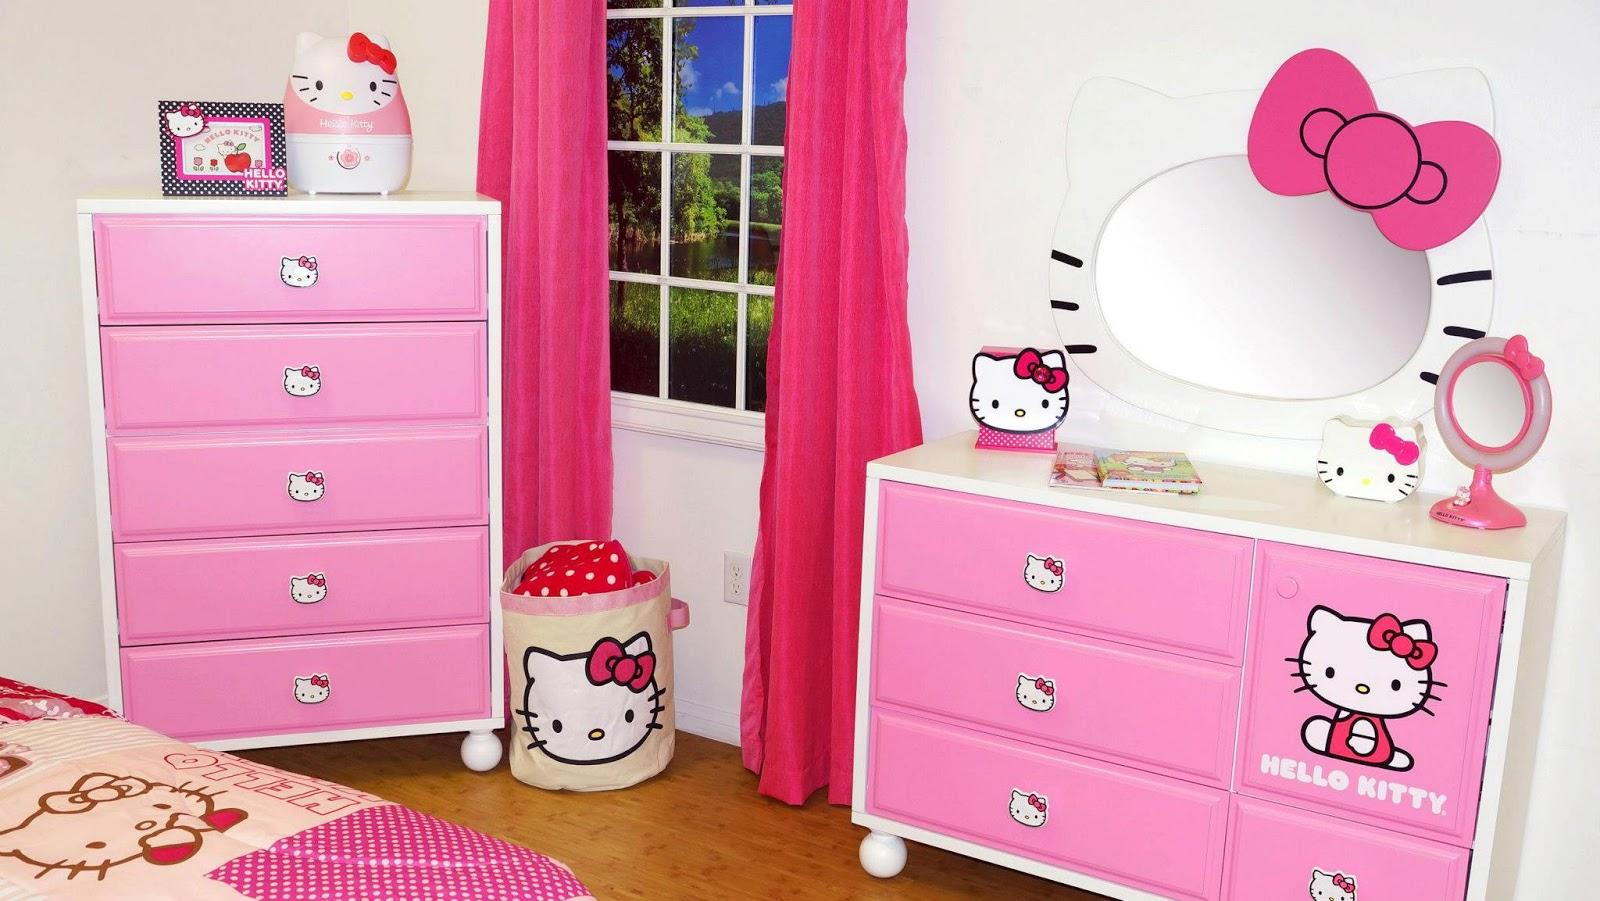 بالصور غرف اطفال بنات , صور تصميمات غرف لارق واجمل بنوته 3640